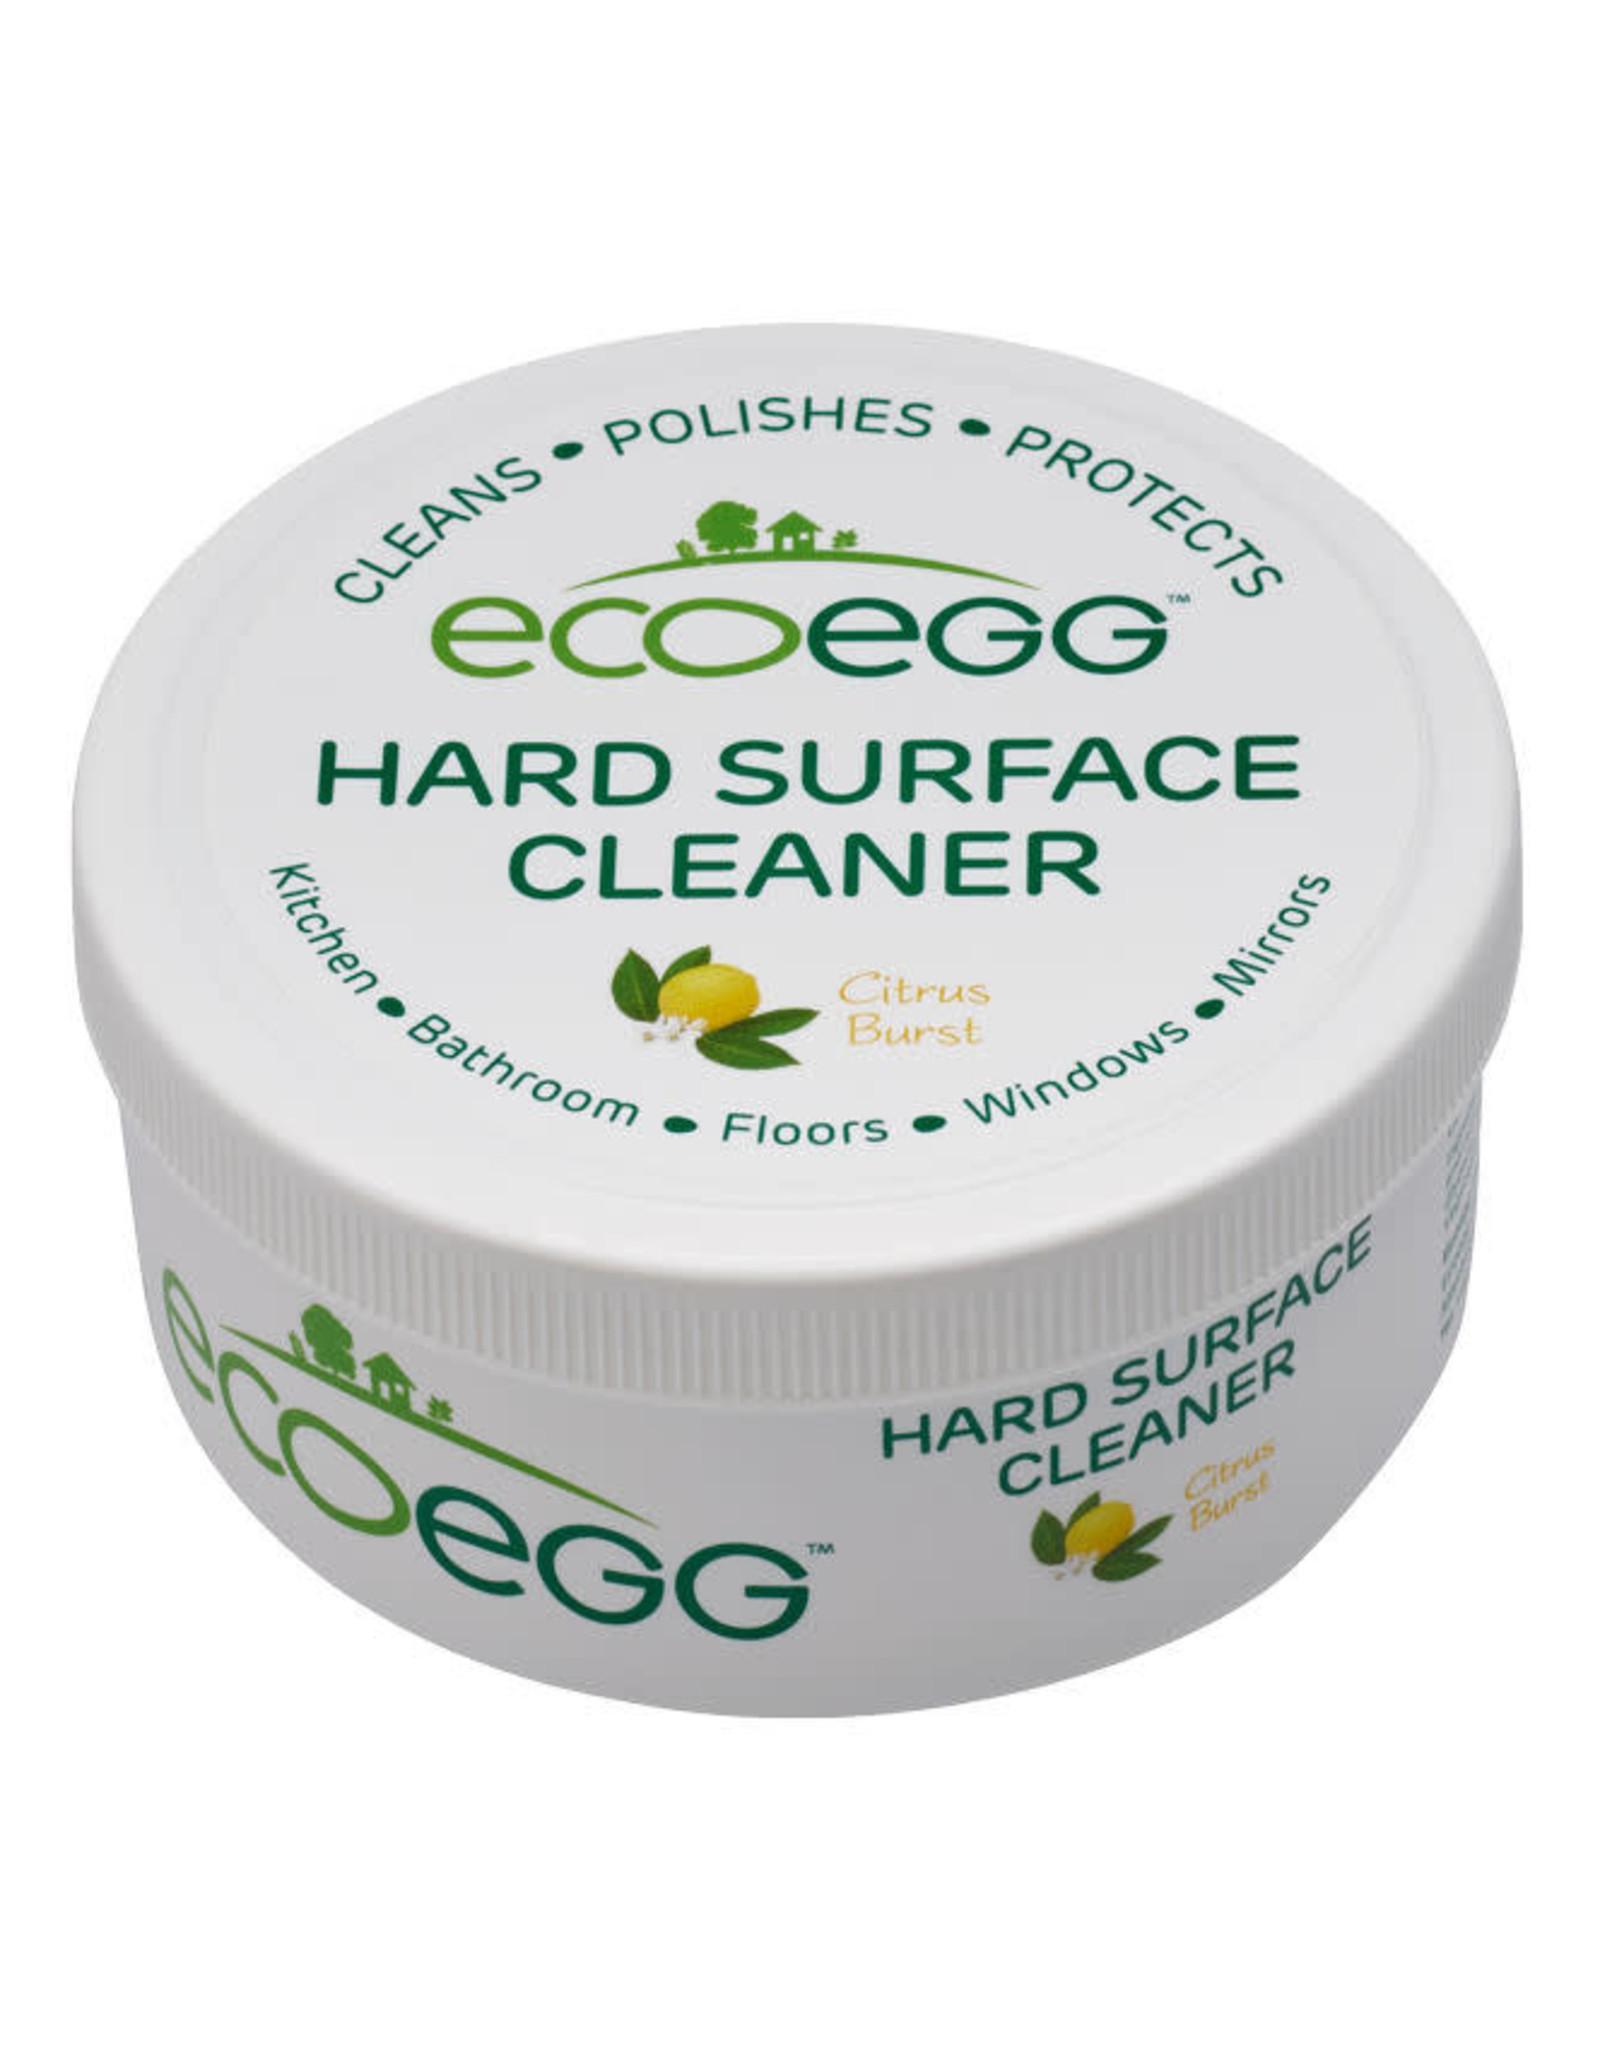 Ecoegg ecoegg Hard Surface Cleaner